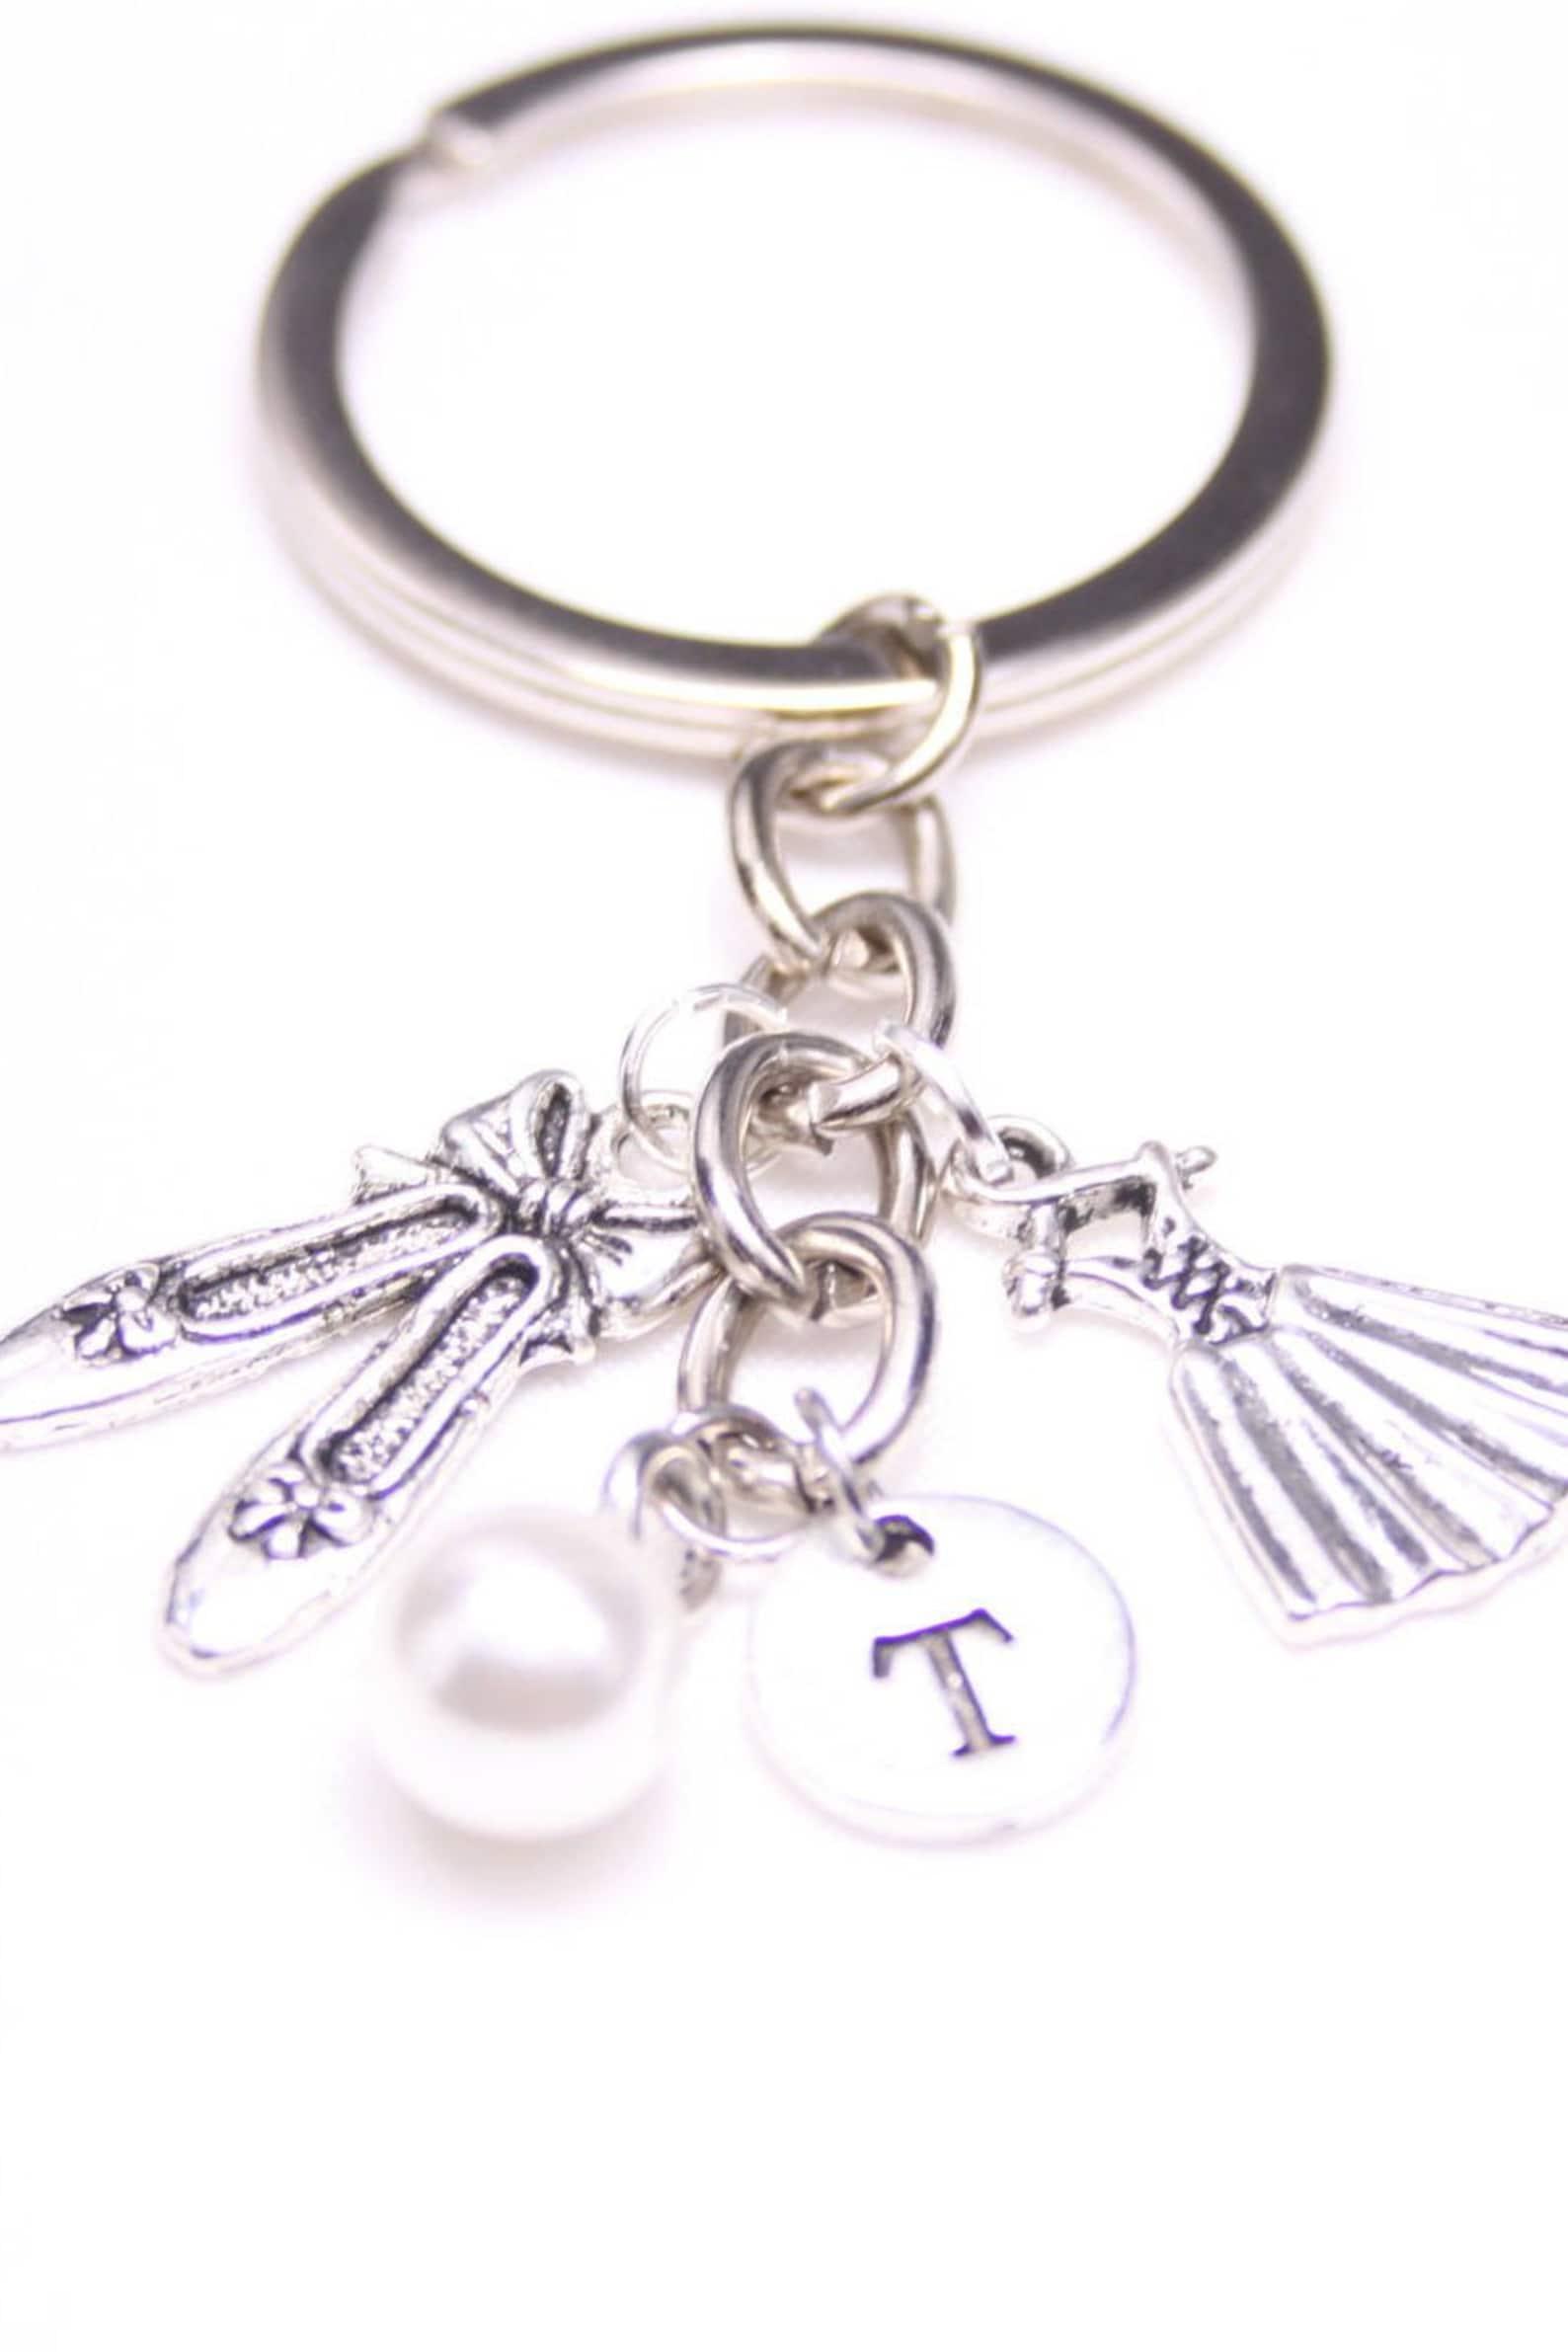 personalized ballerina keychain gift, ballet shoes dress keyring gift, dancer keychain, gift for best friend, gift for friend, g